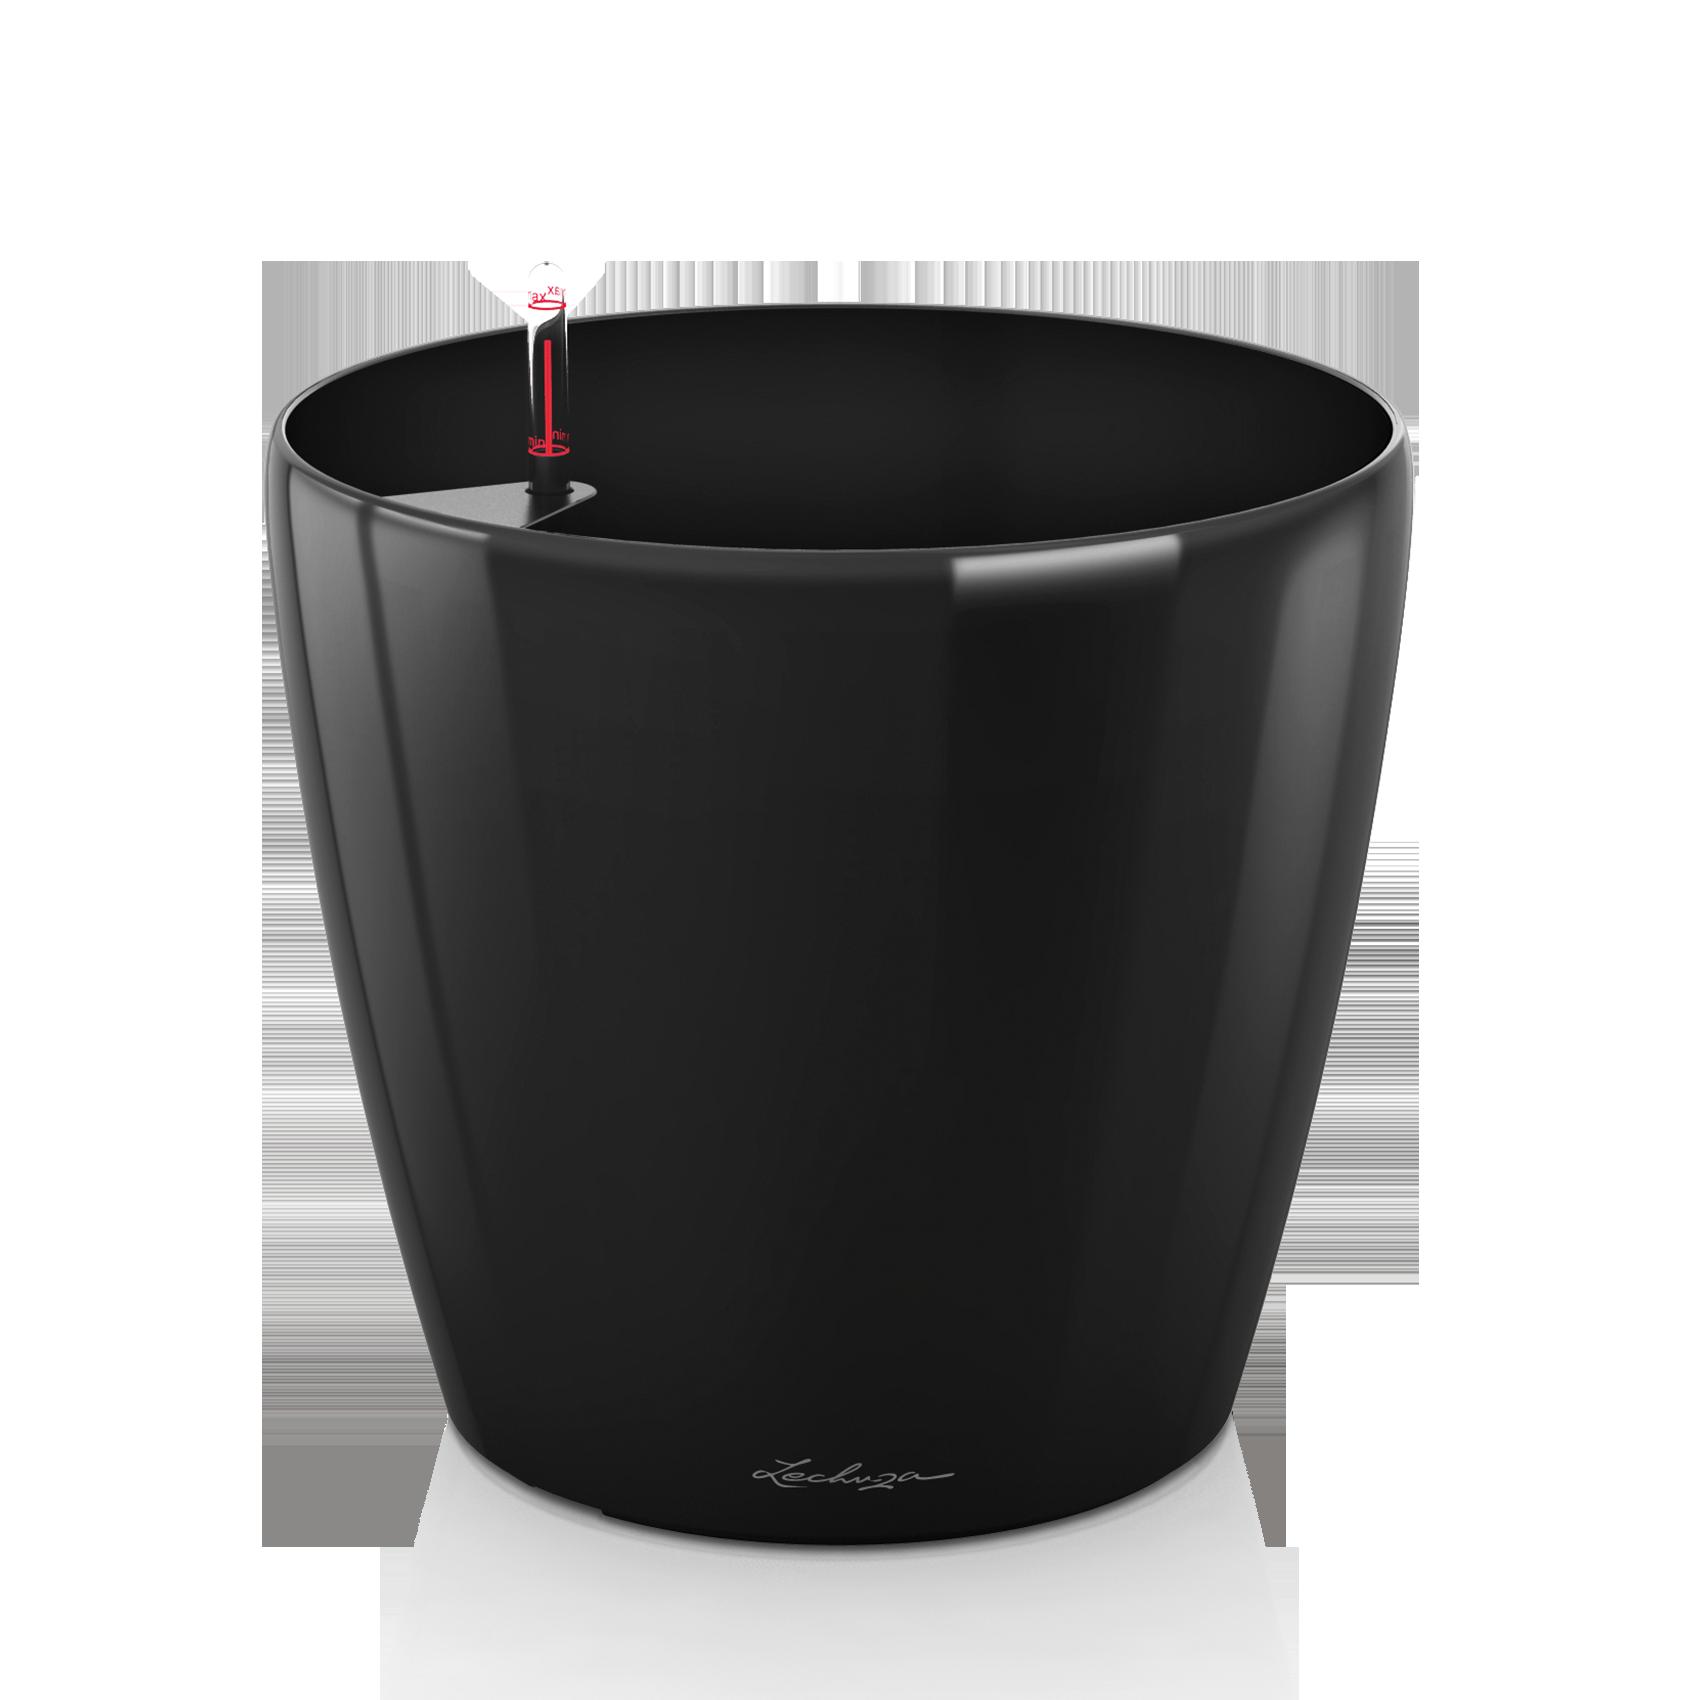 CLASSICO 60 black high-gloss